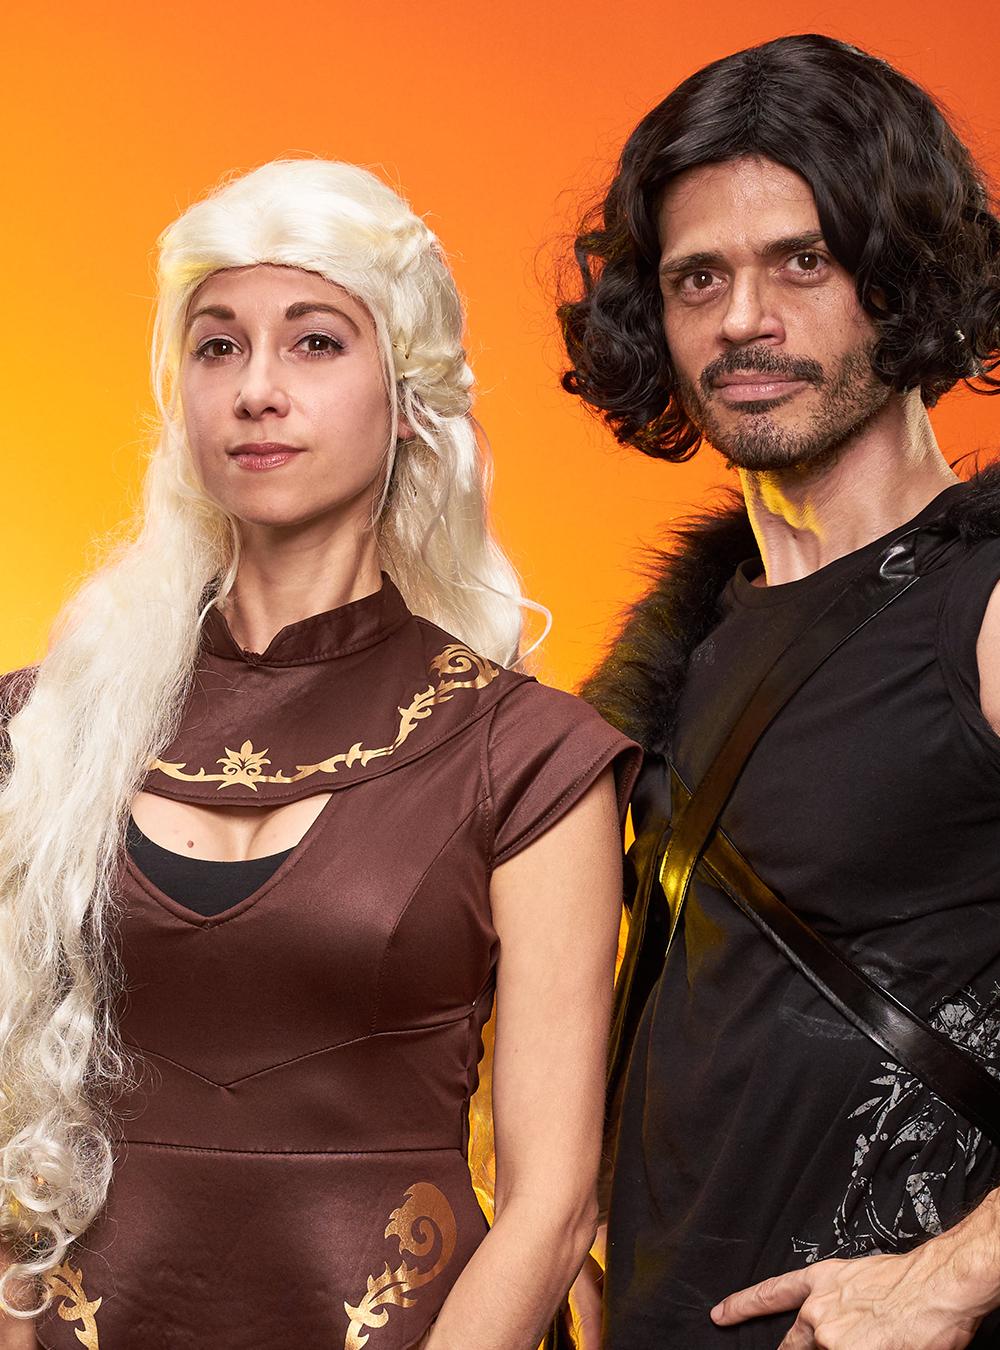 Jon Snow and Daeneryous